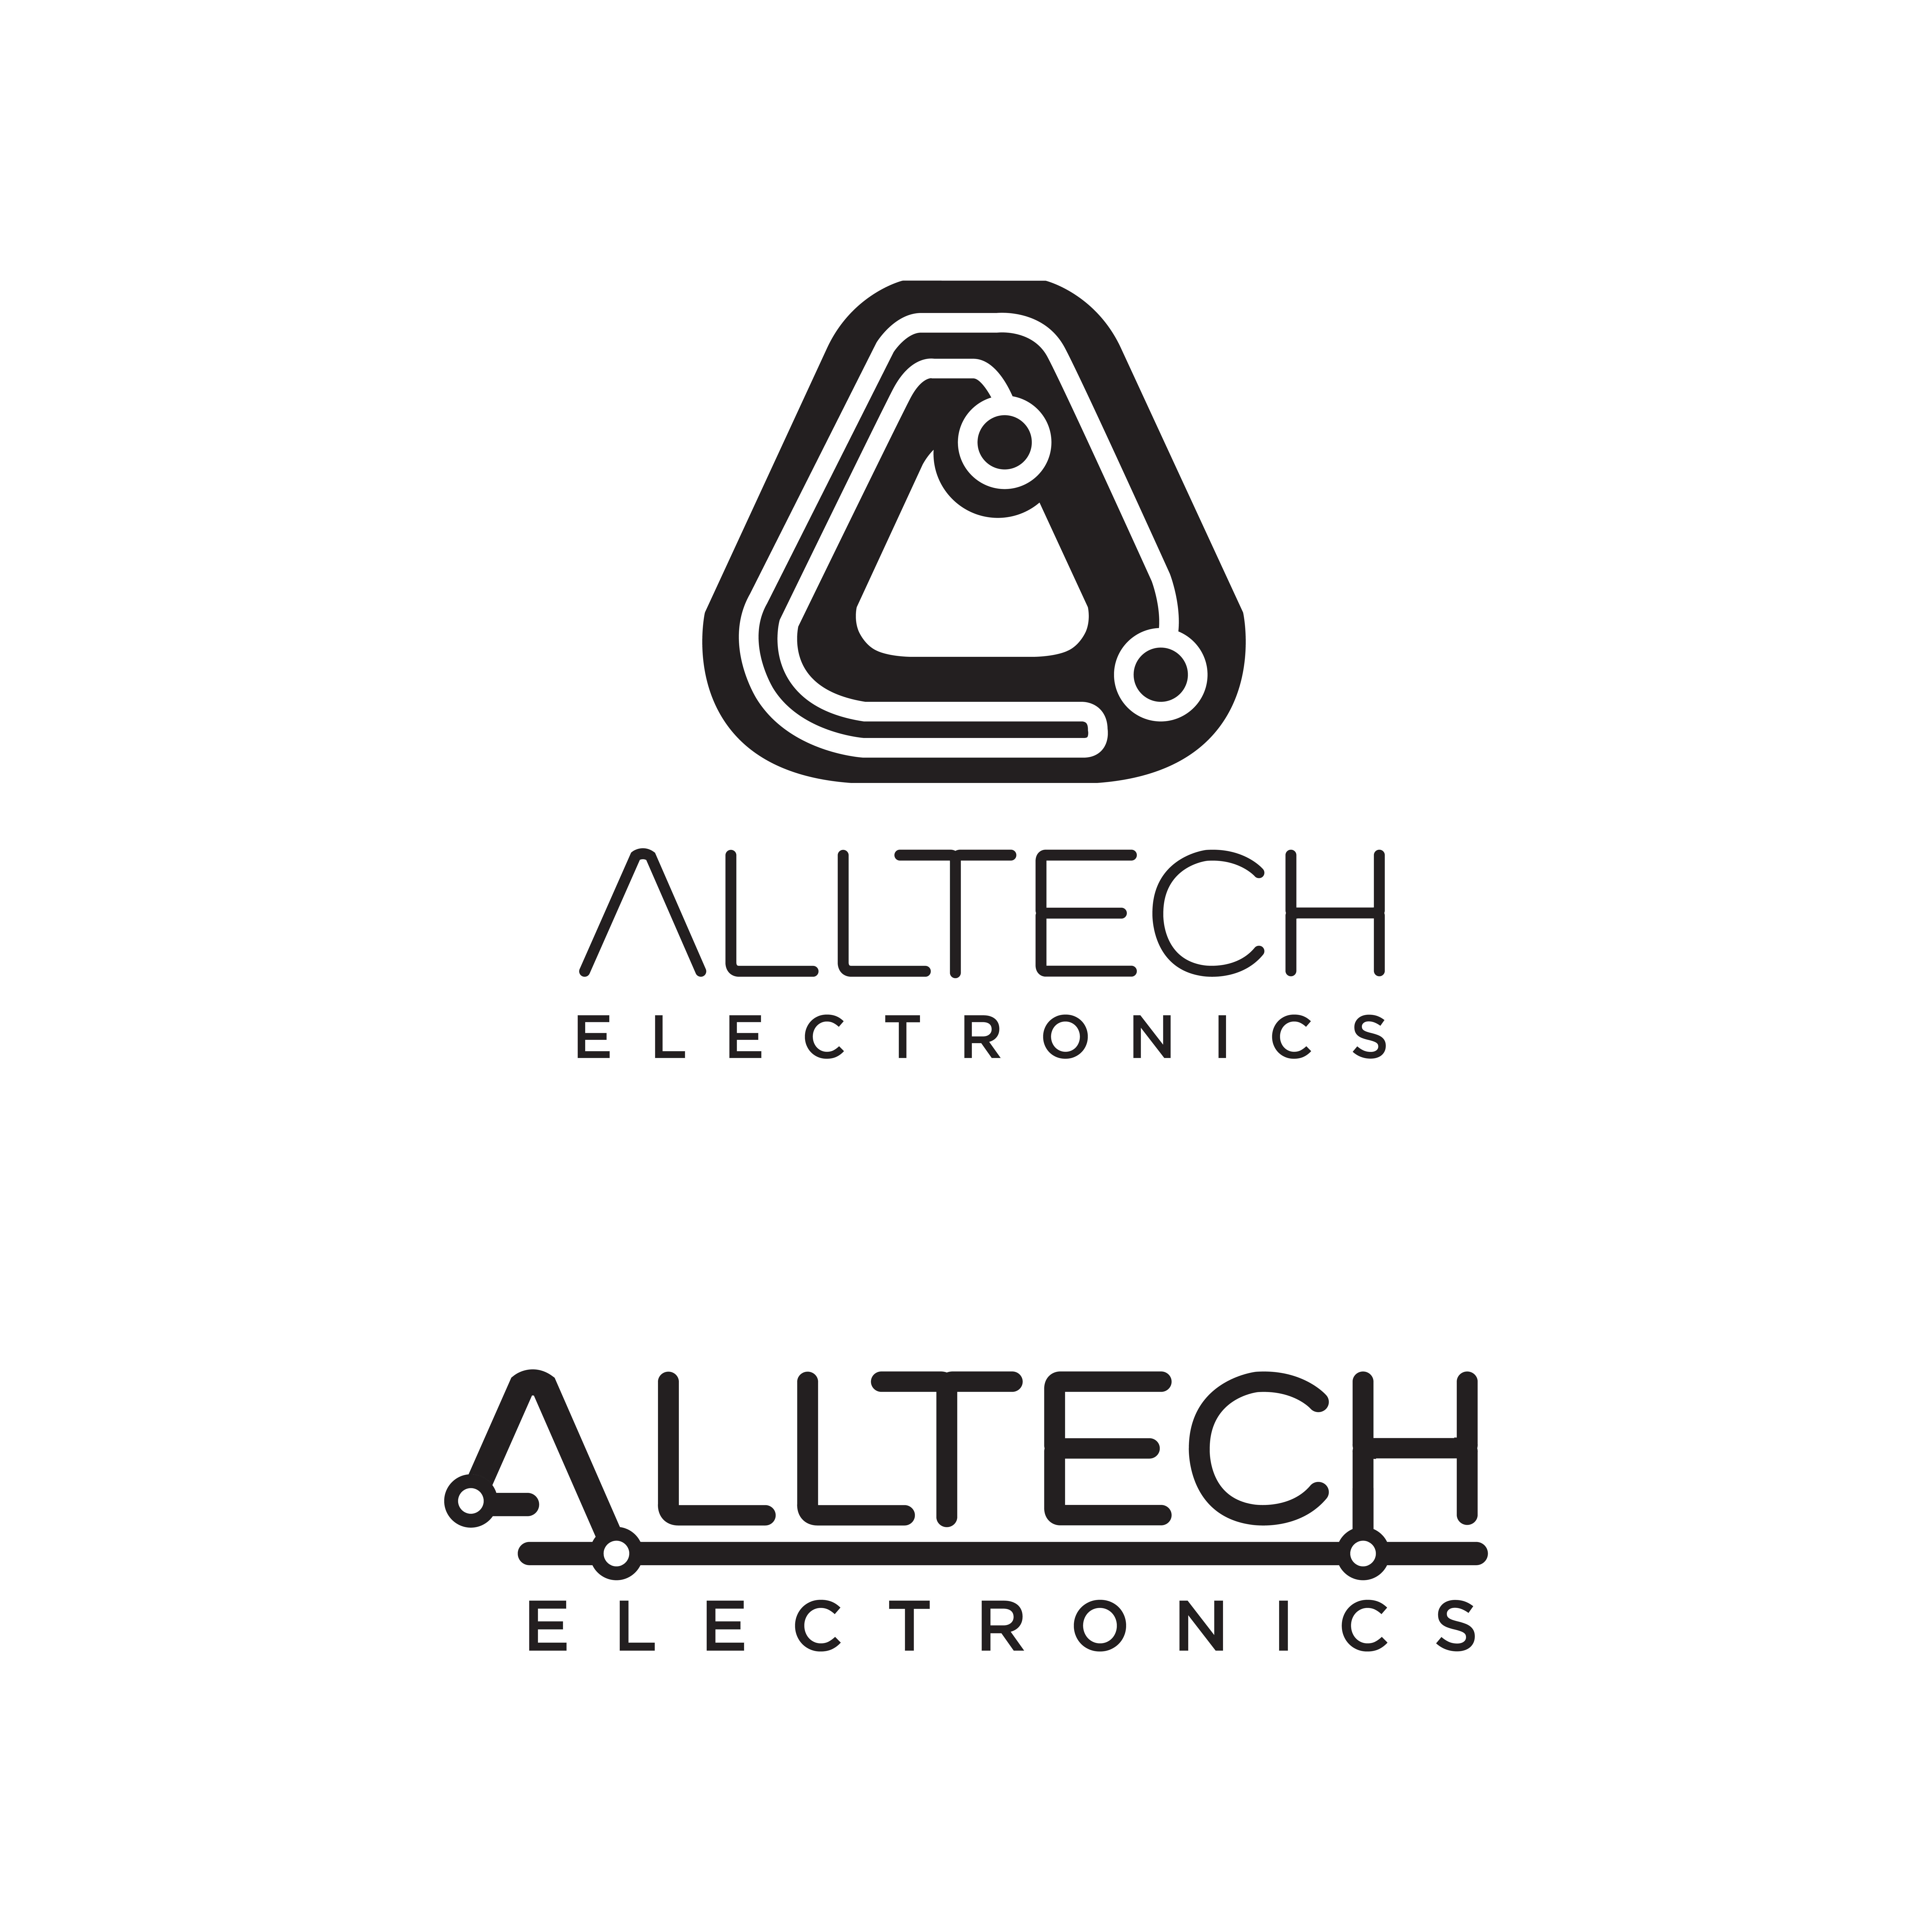 ALLTECH ELECTRONICS ltd logo